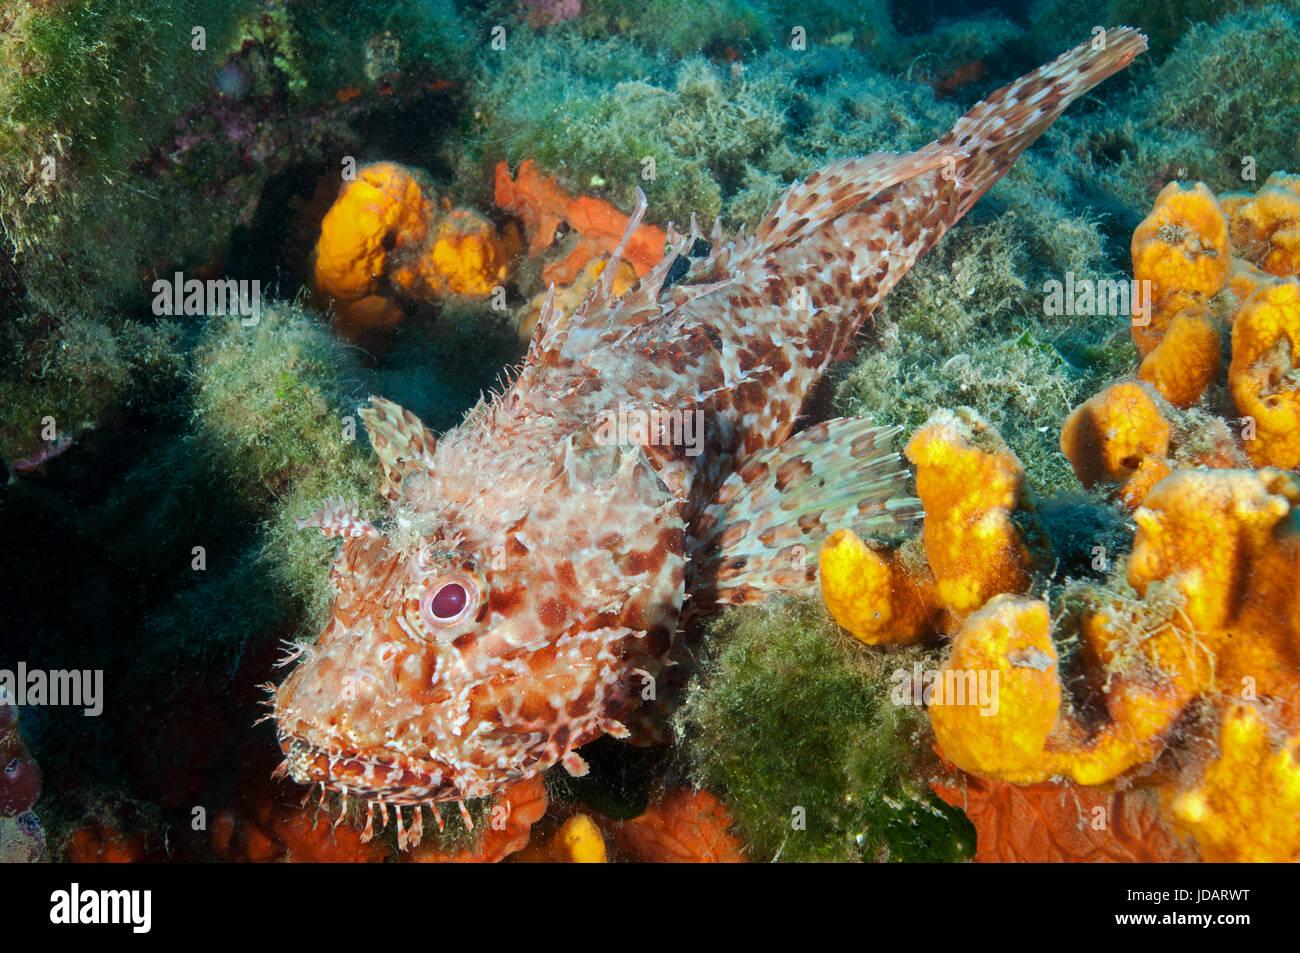 Scorpionfish, Scorpaena scrofa, in Gokova Bay Marine Protected Area Turkey - Stock Image